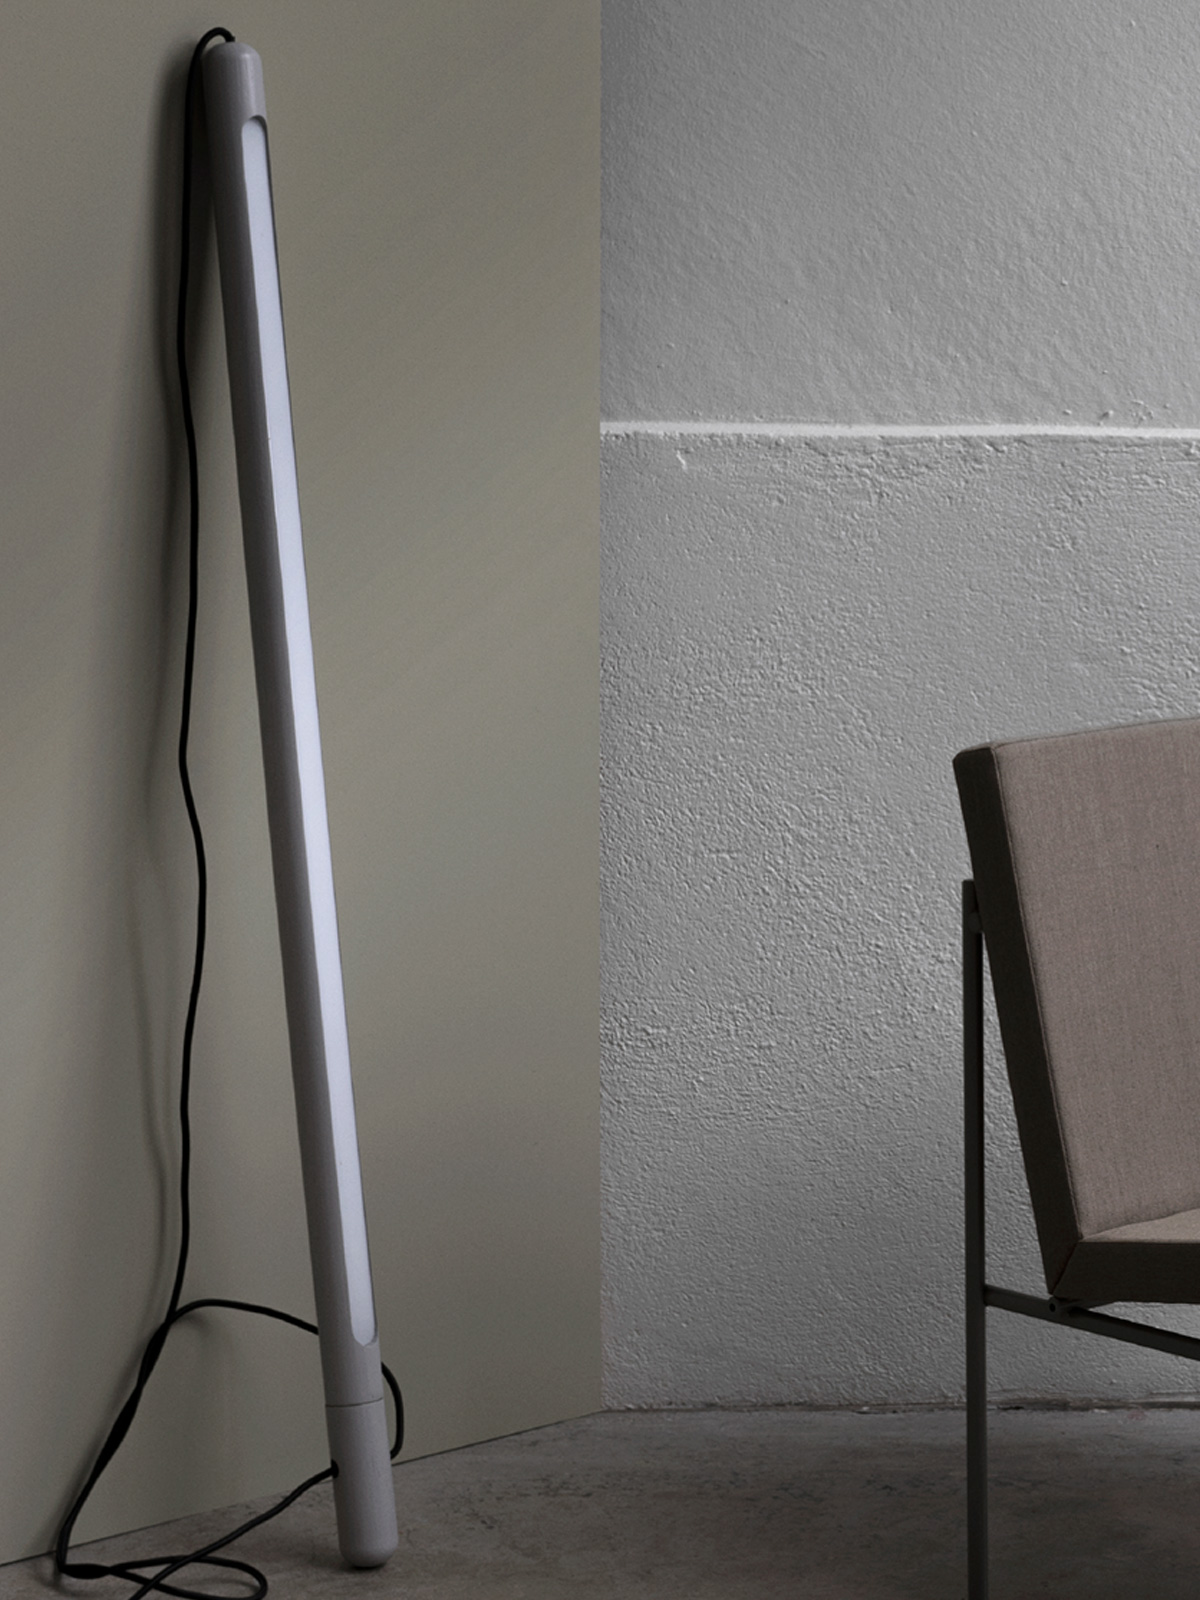 DesignOrt Lampen Blog: Palo Lamp MUNK DesignOrt Onlineshop Lampen Berlin